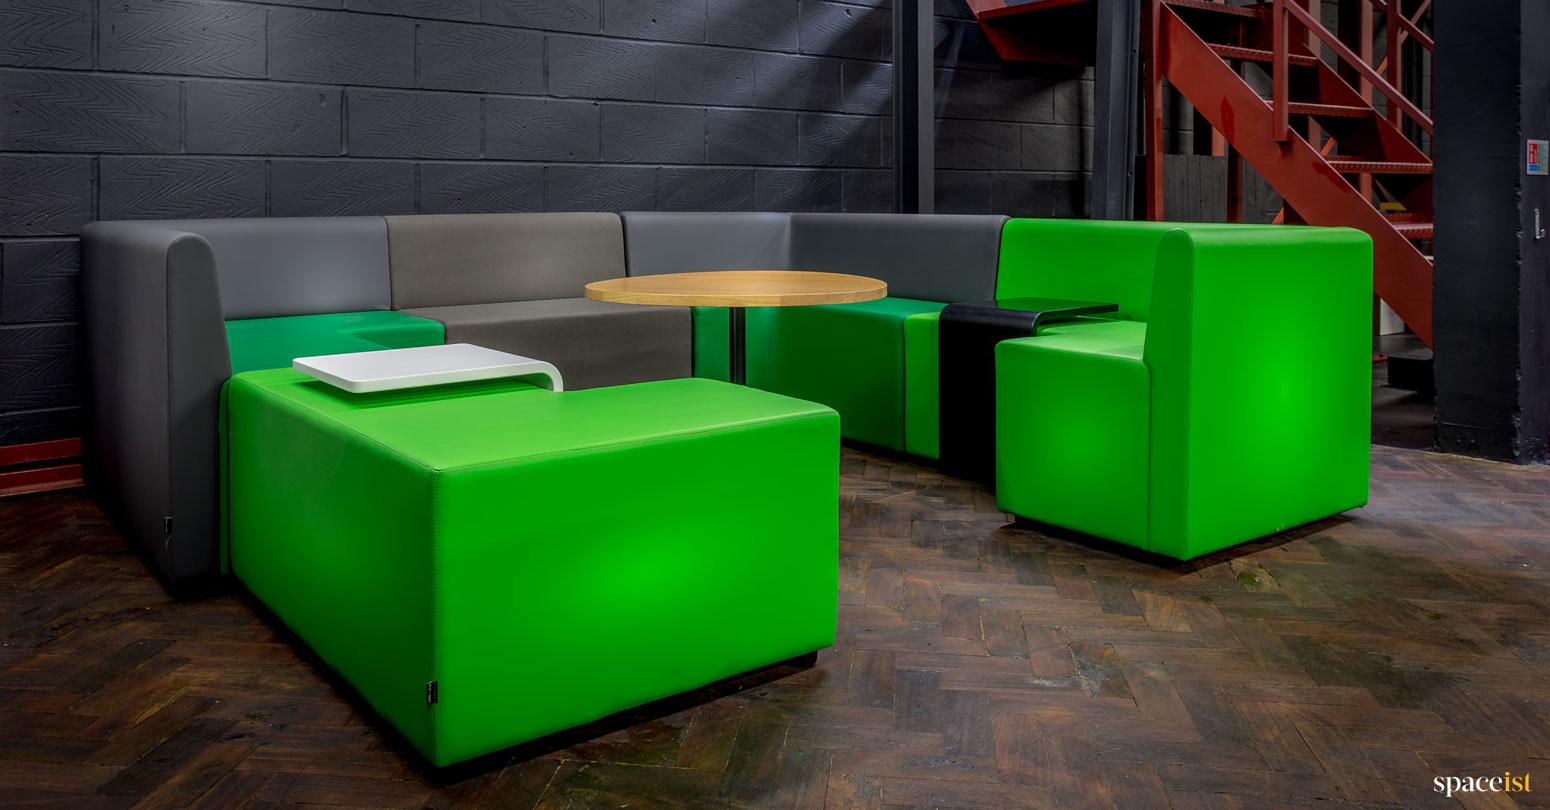 spaceist showroom green modular cubes